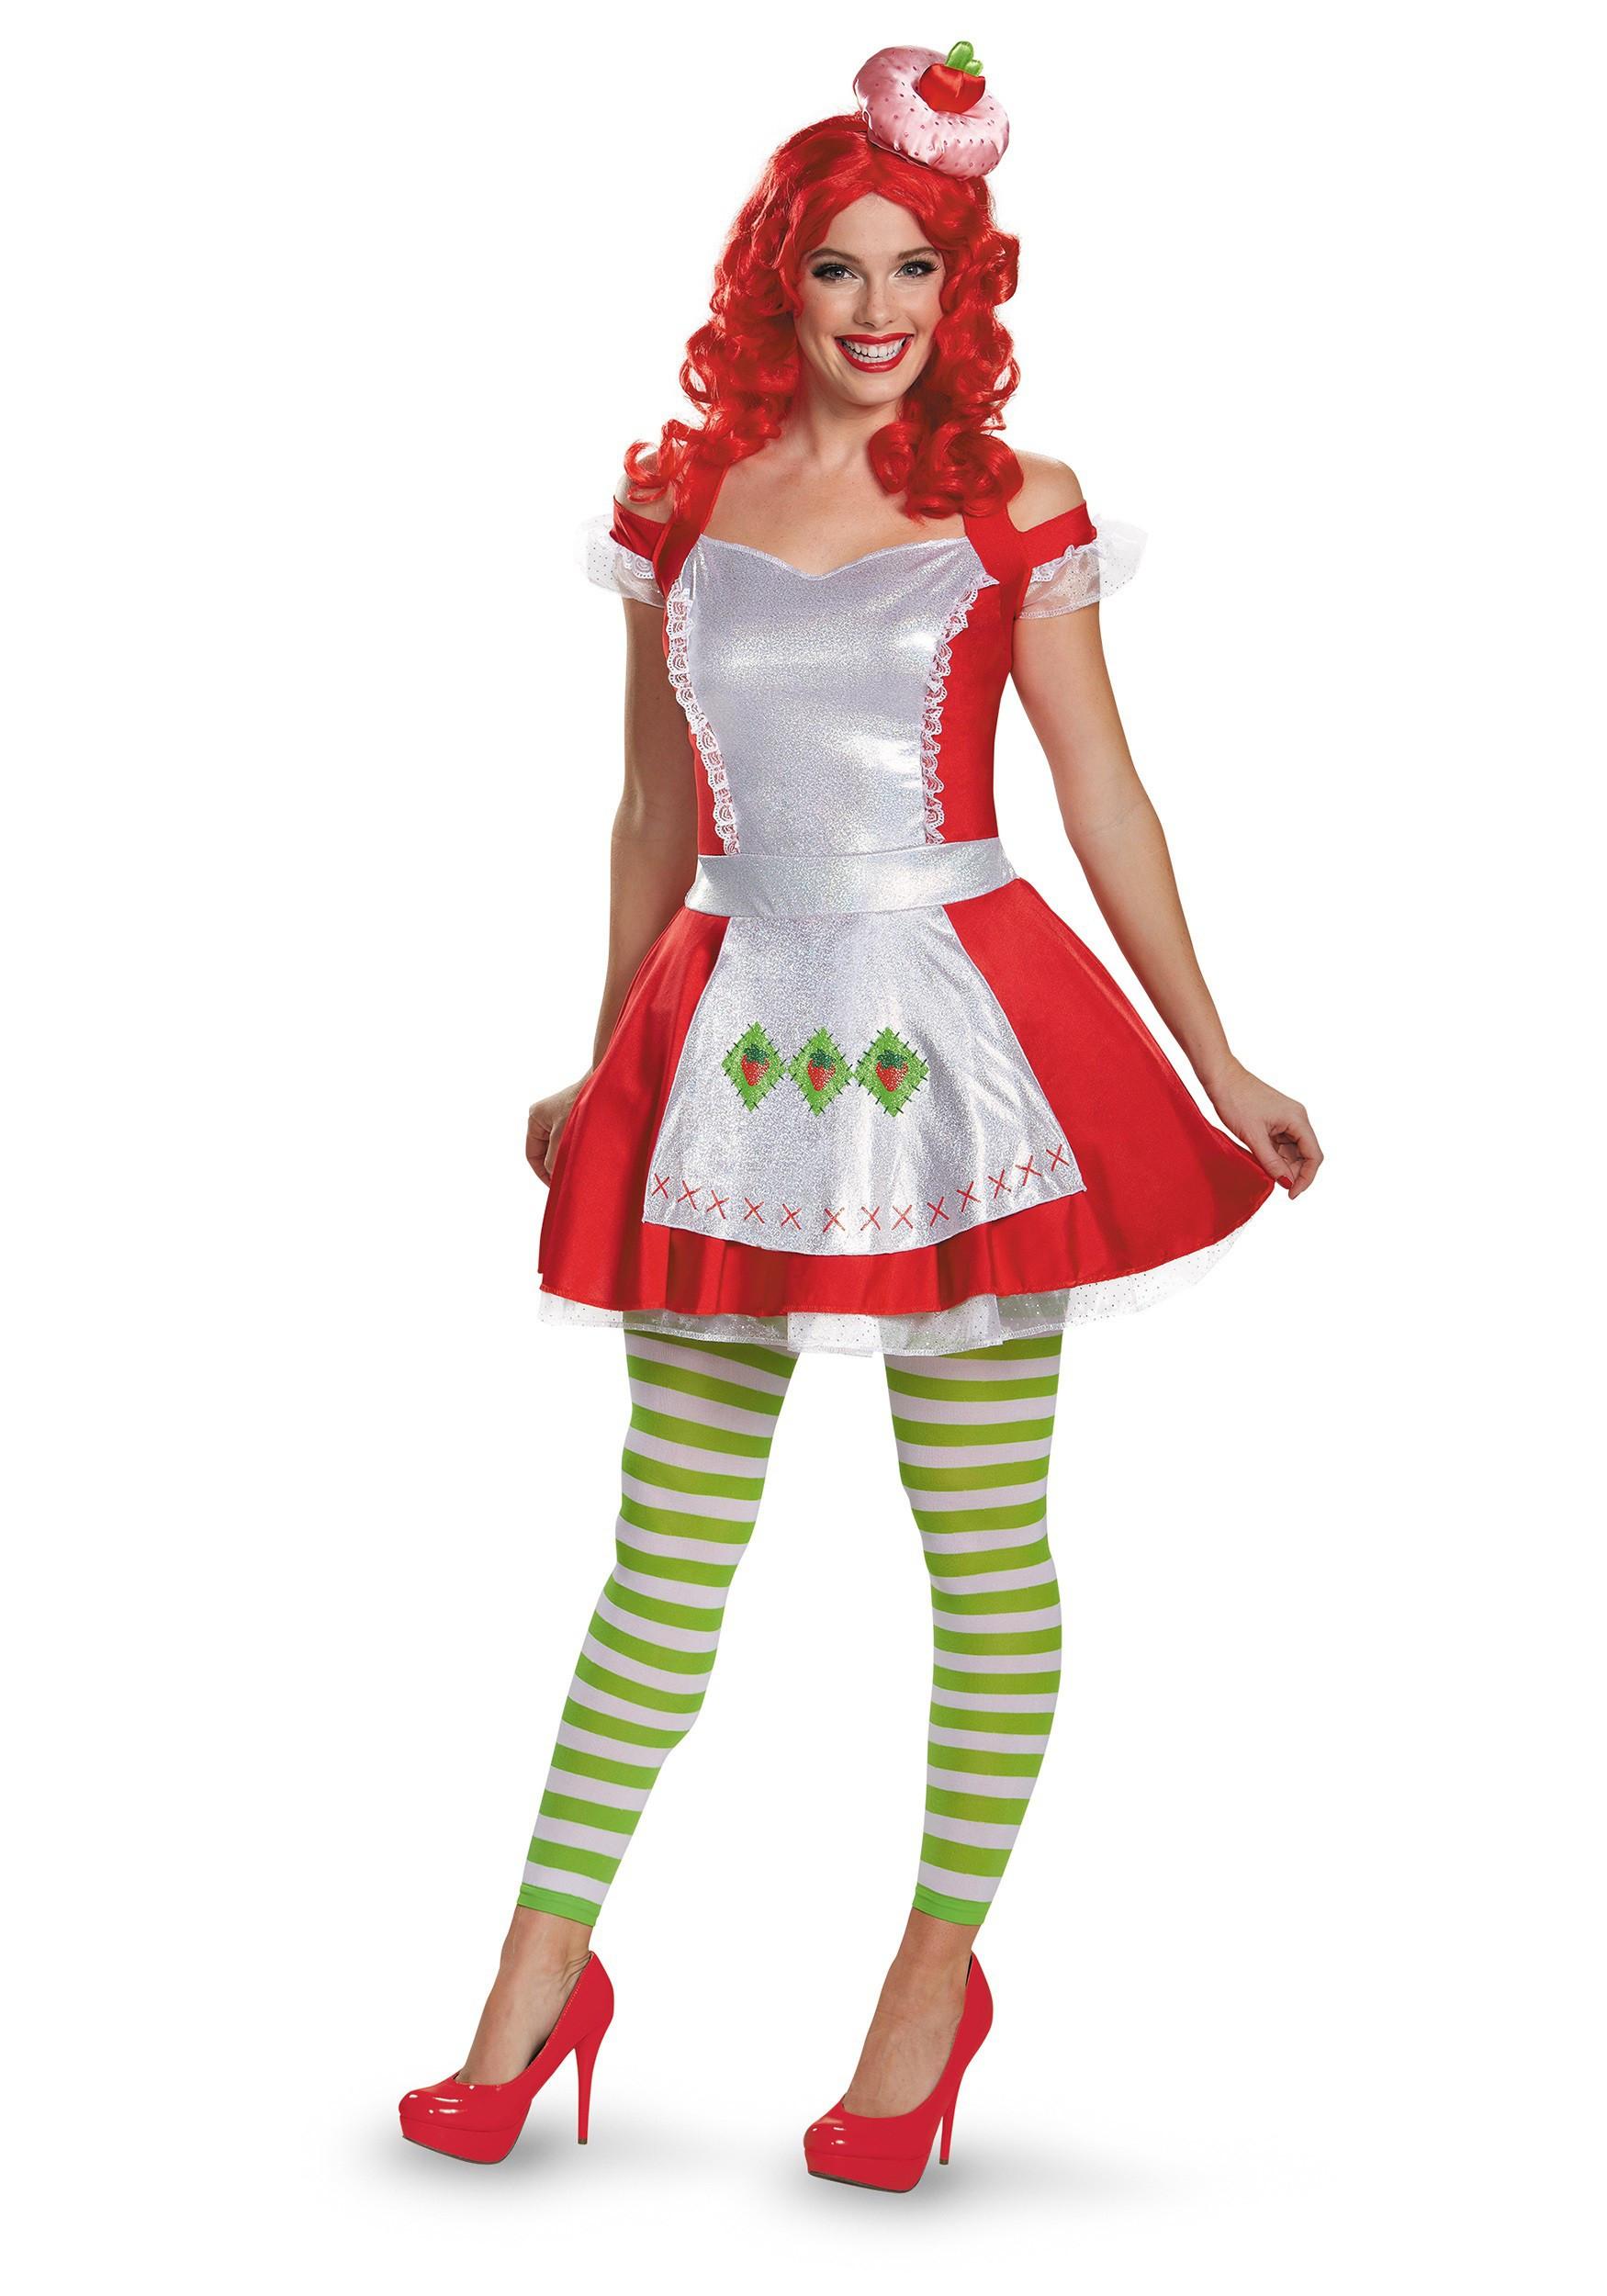 Strawberry Short Cake Halloween  Strawberry Shortcake Deluxe Adult Costume